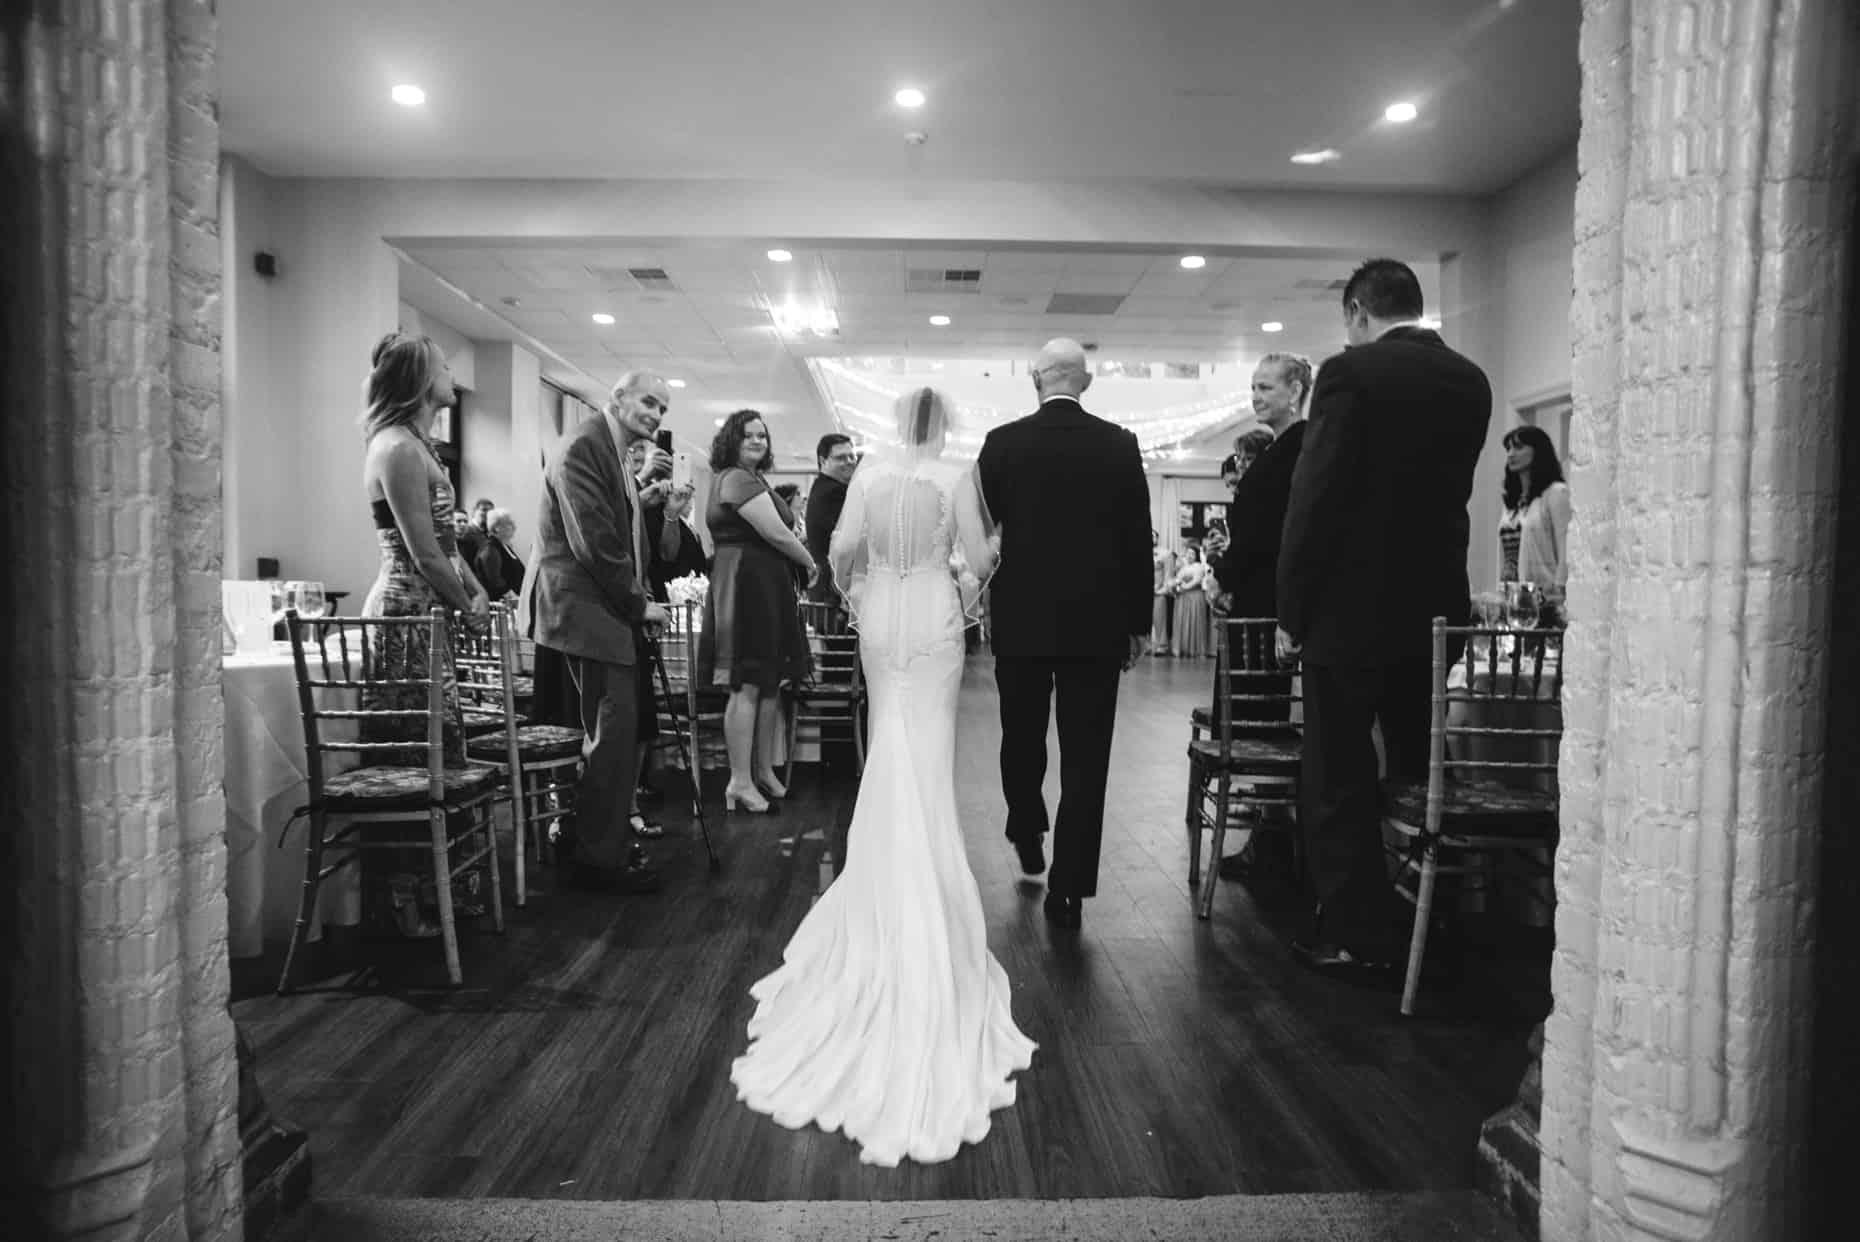 Bucks County Mansion Wedding Photographer